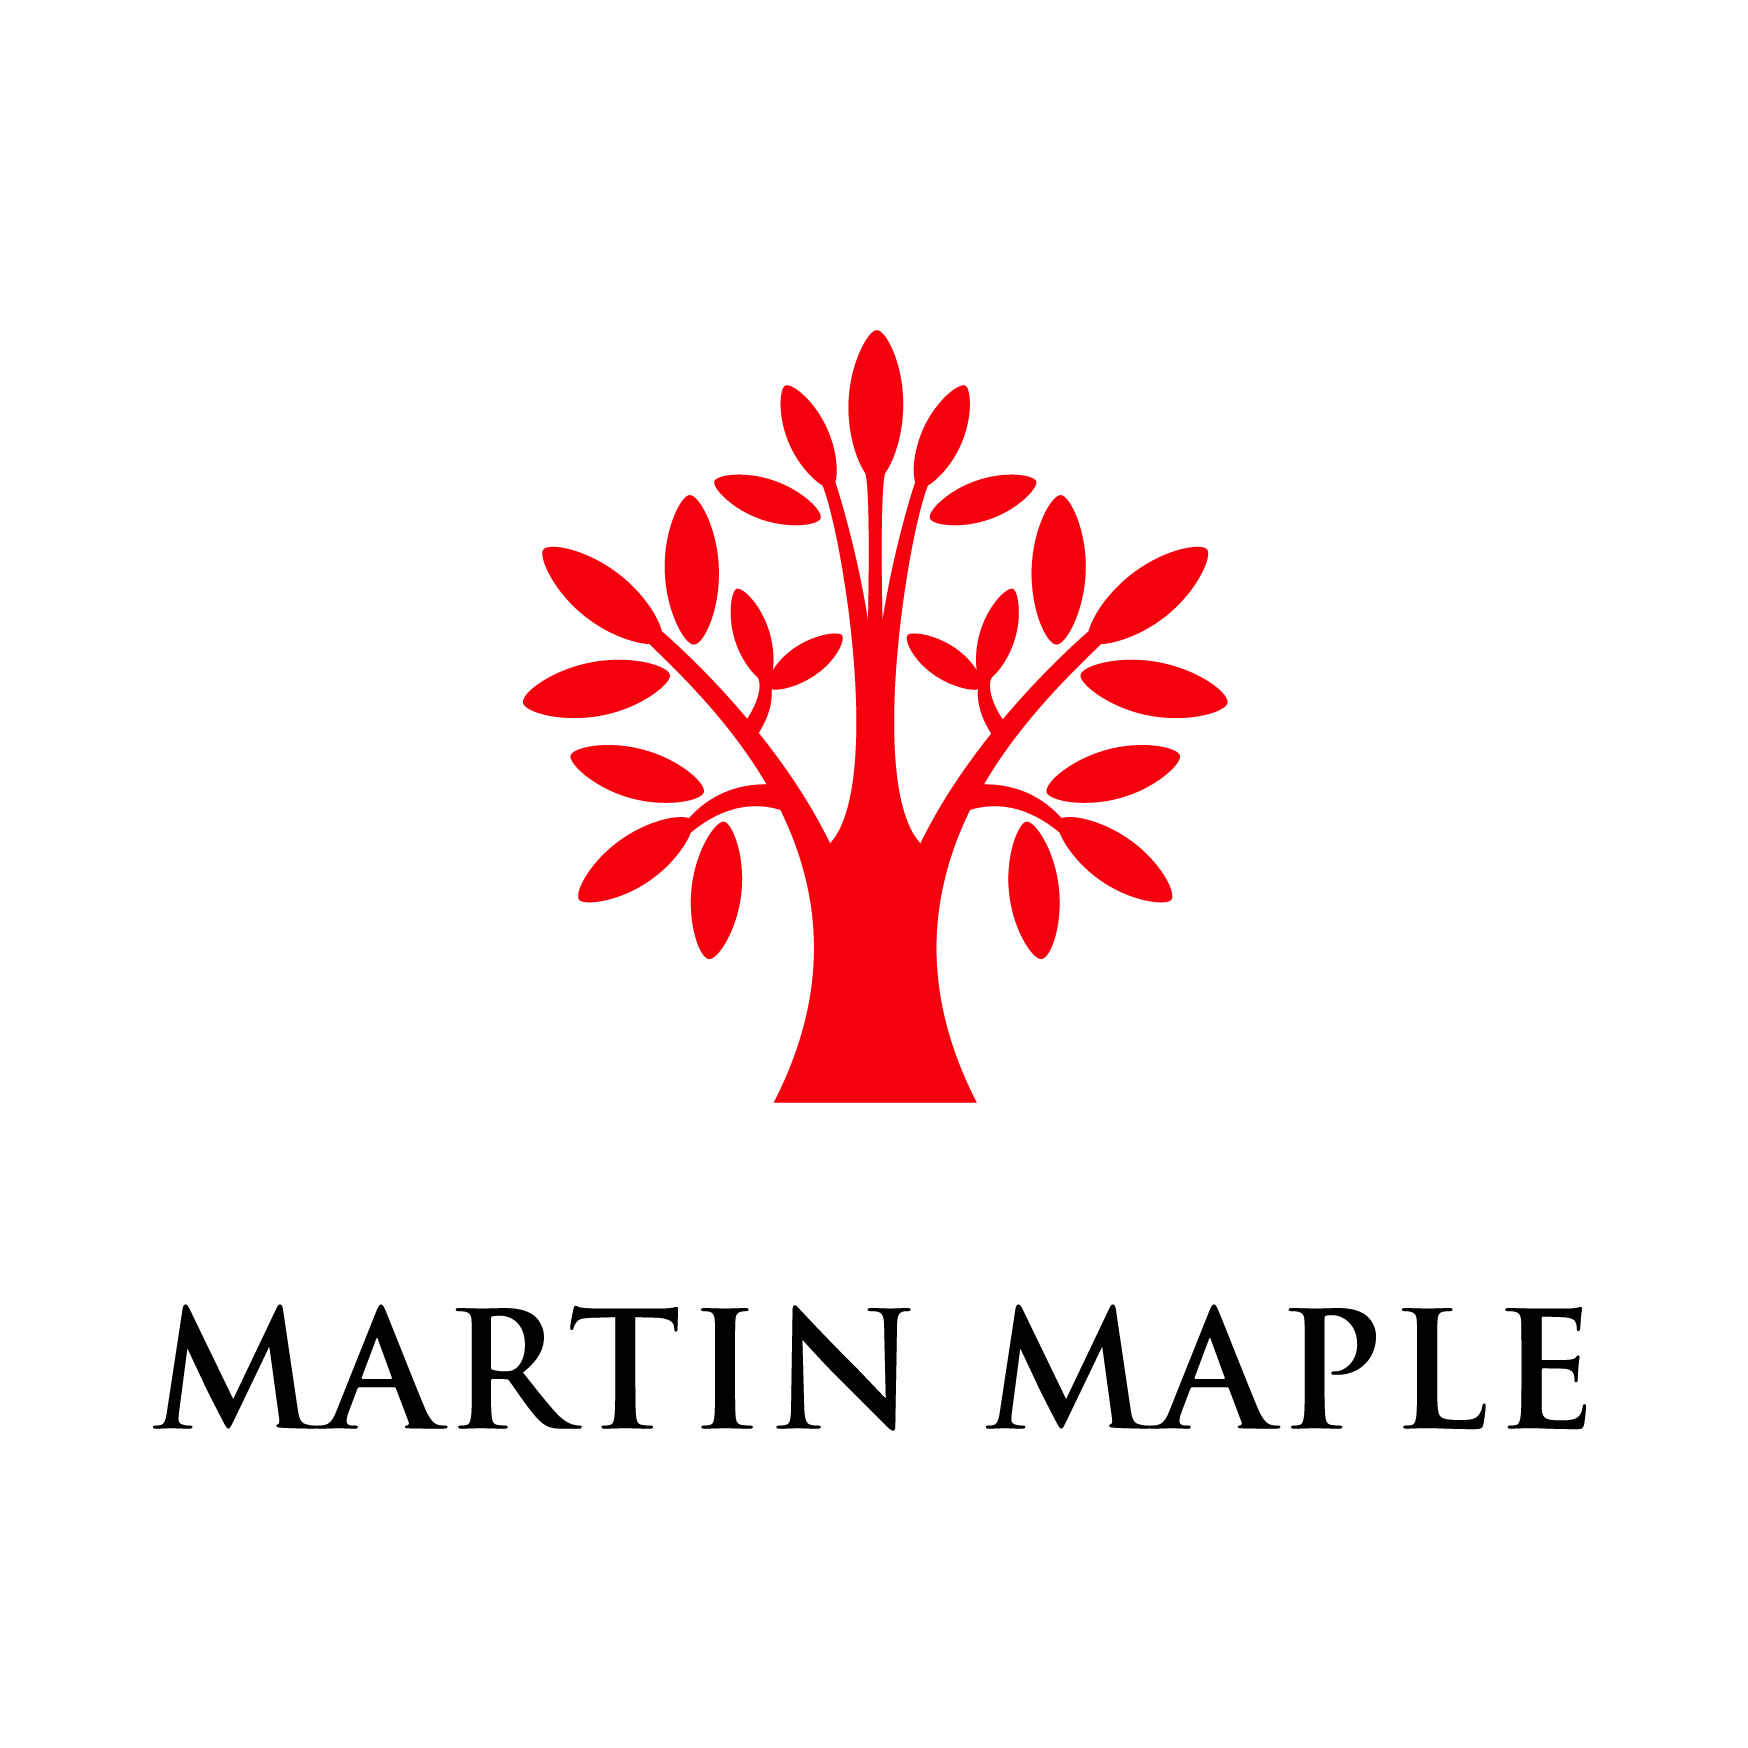 Martin Maple